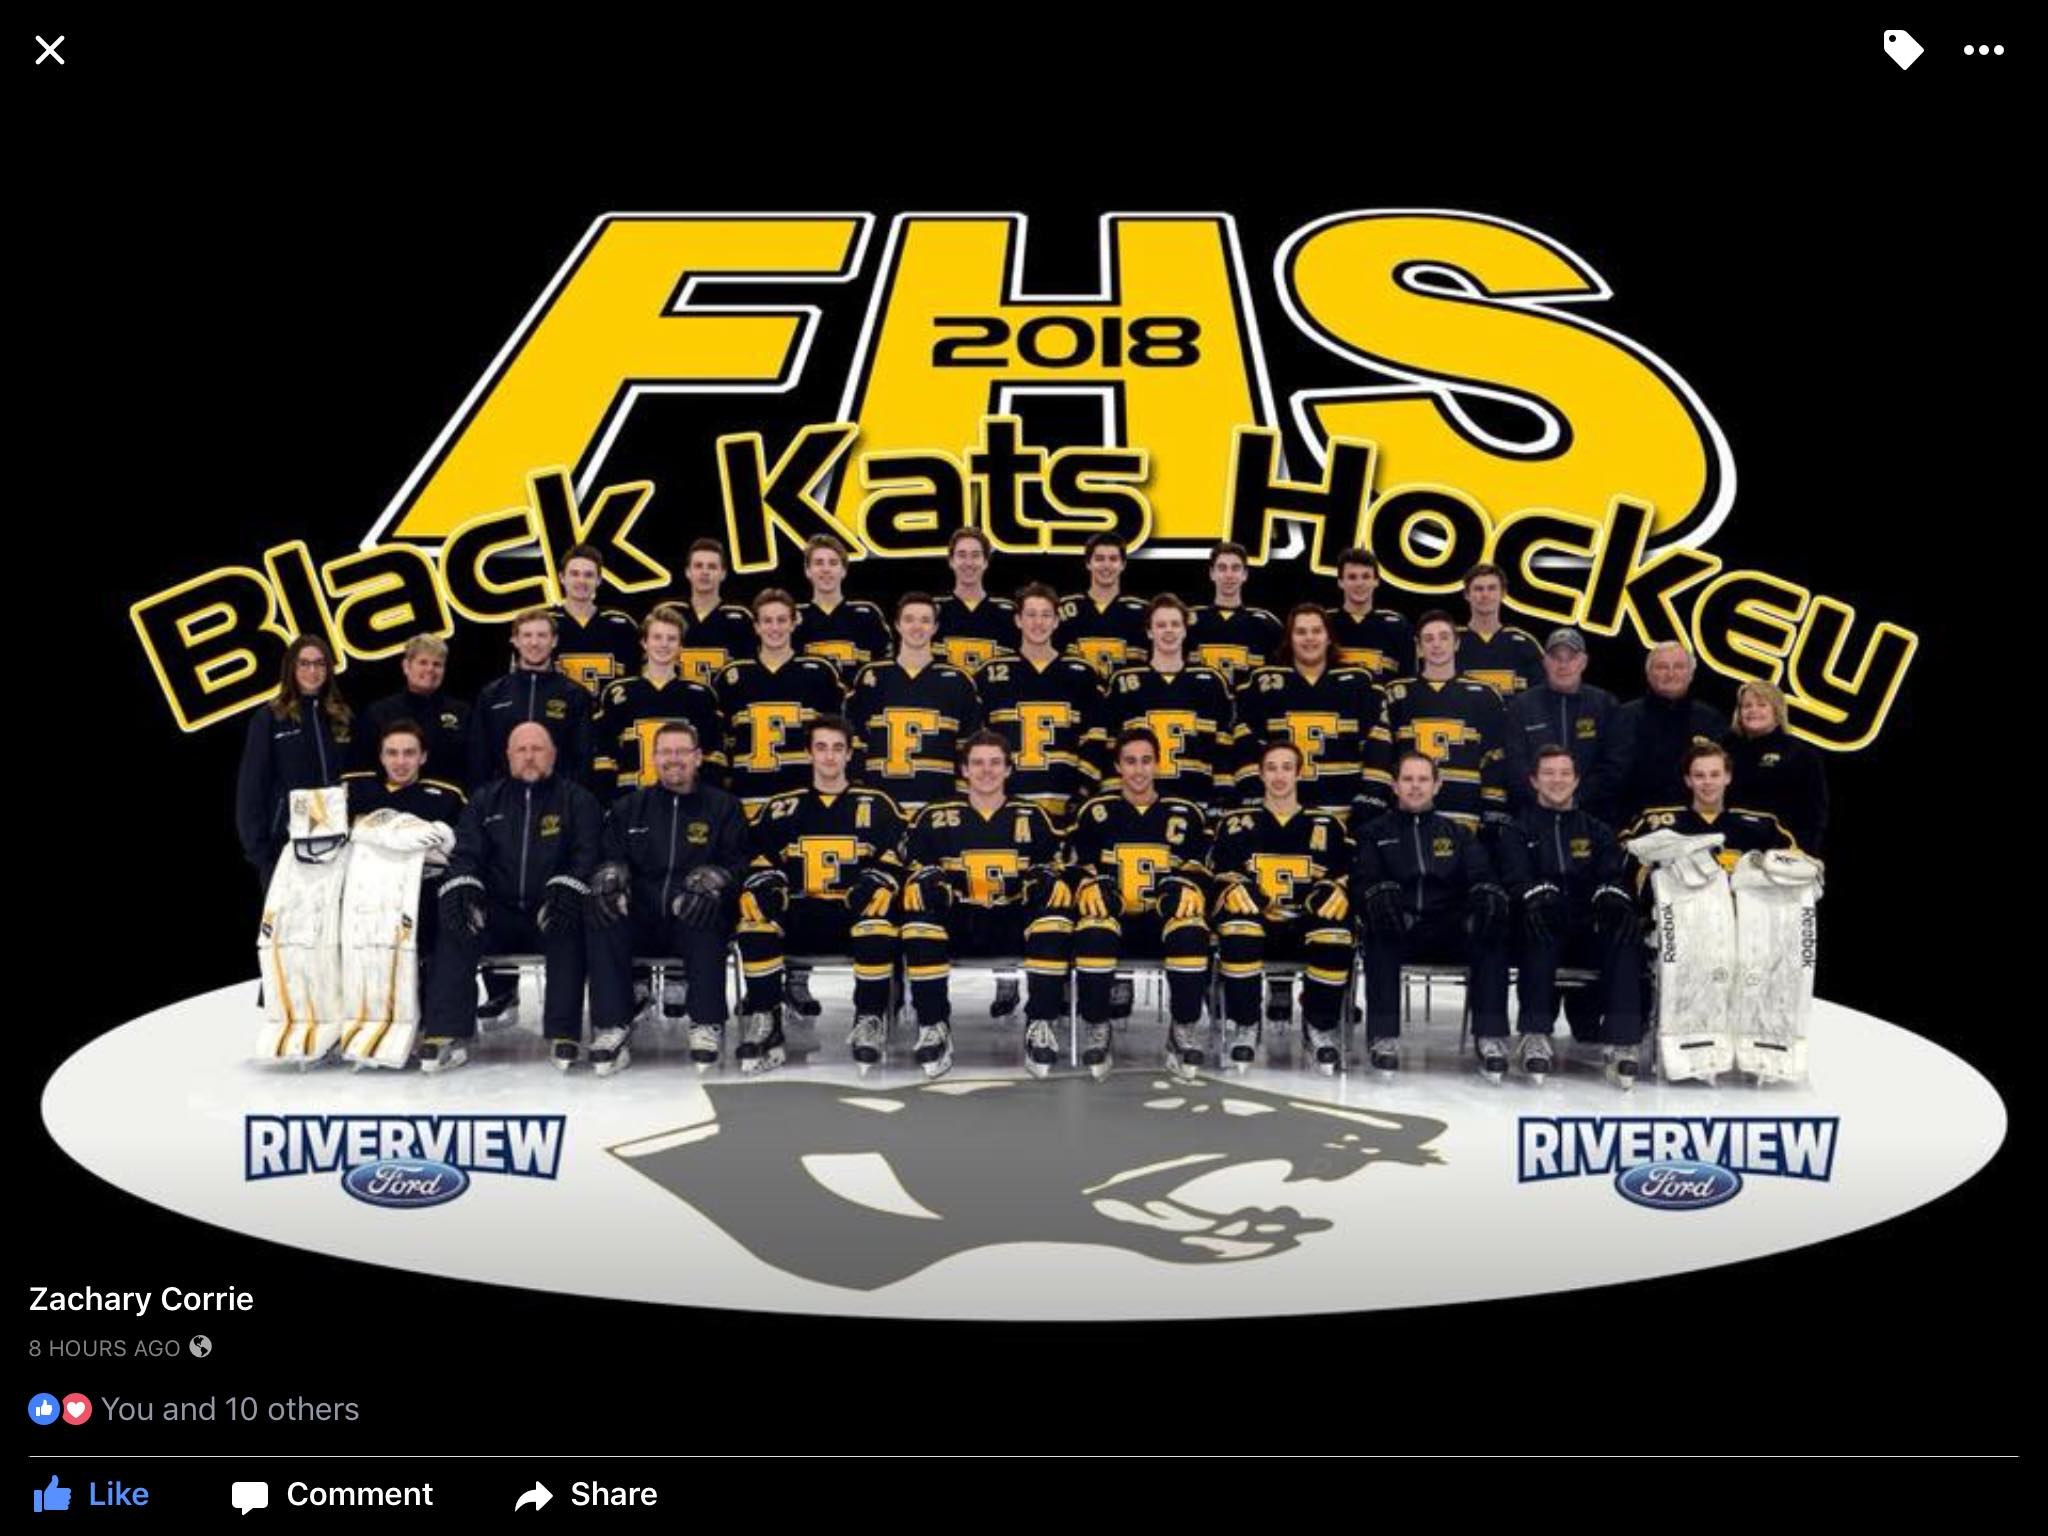 fhs-aaa-black-kats-men-hockey